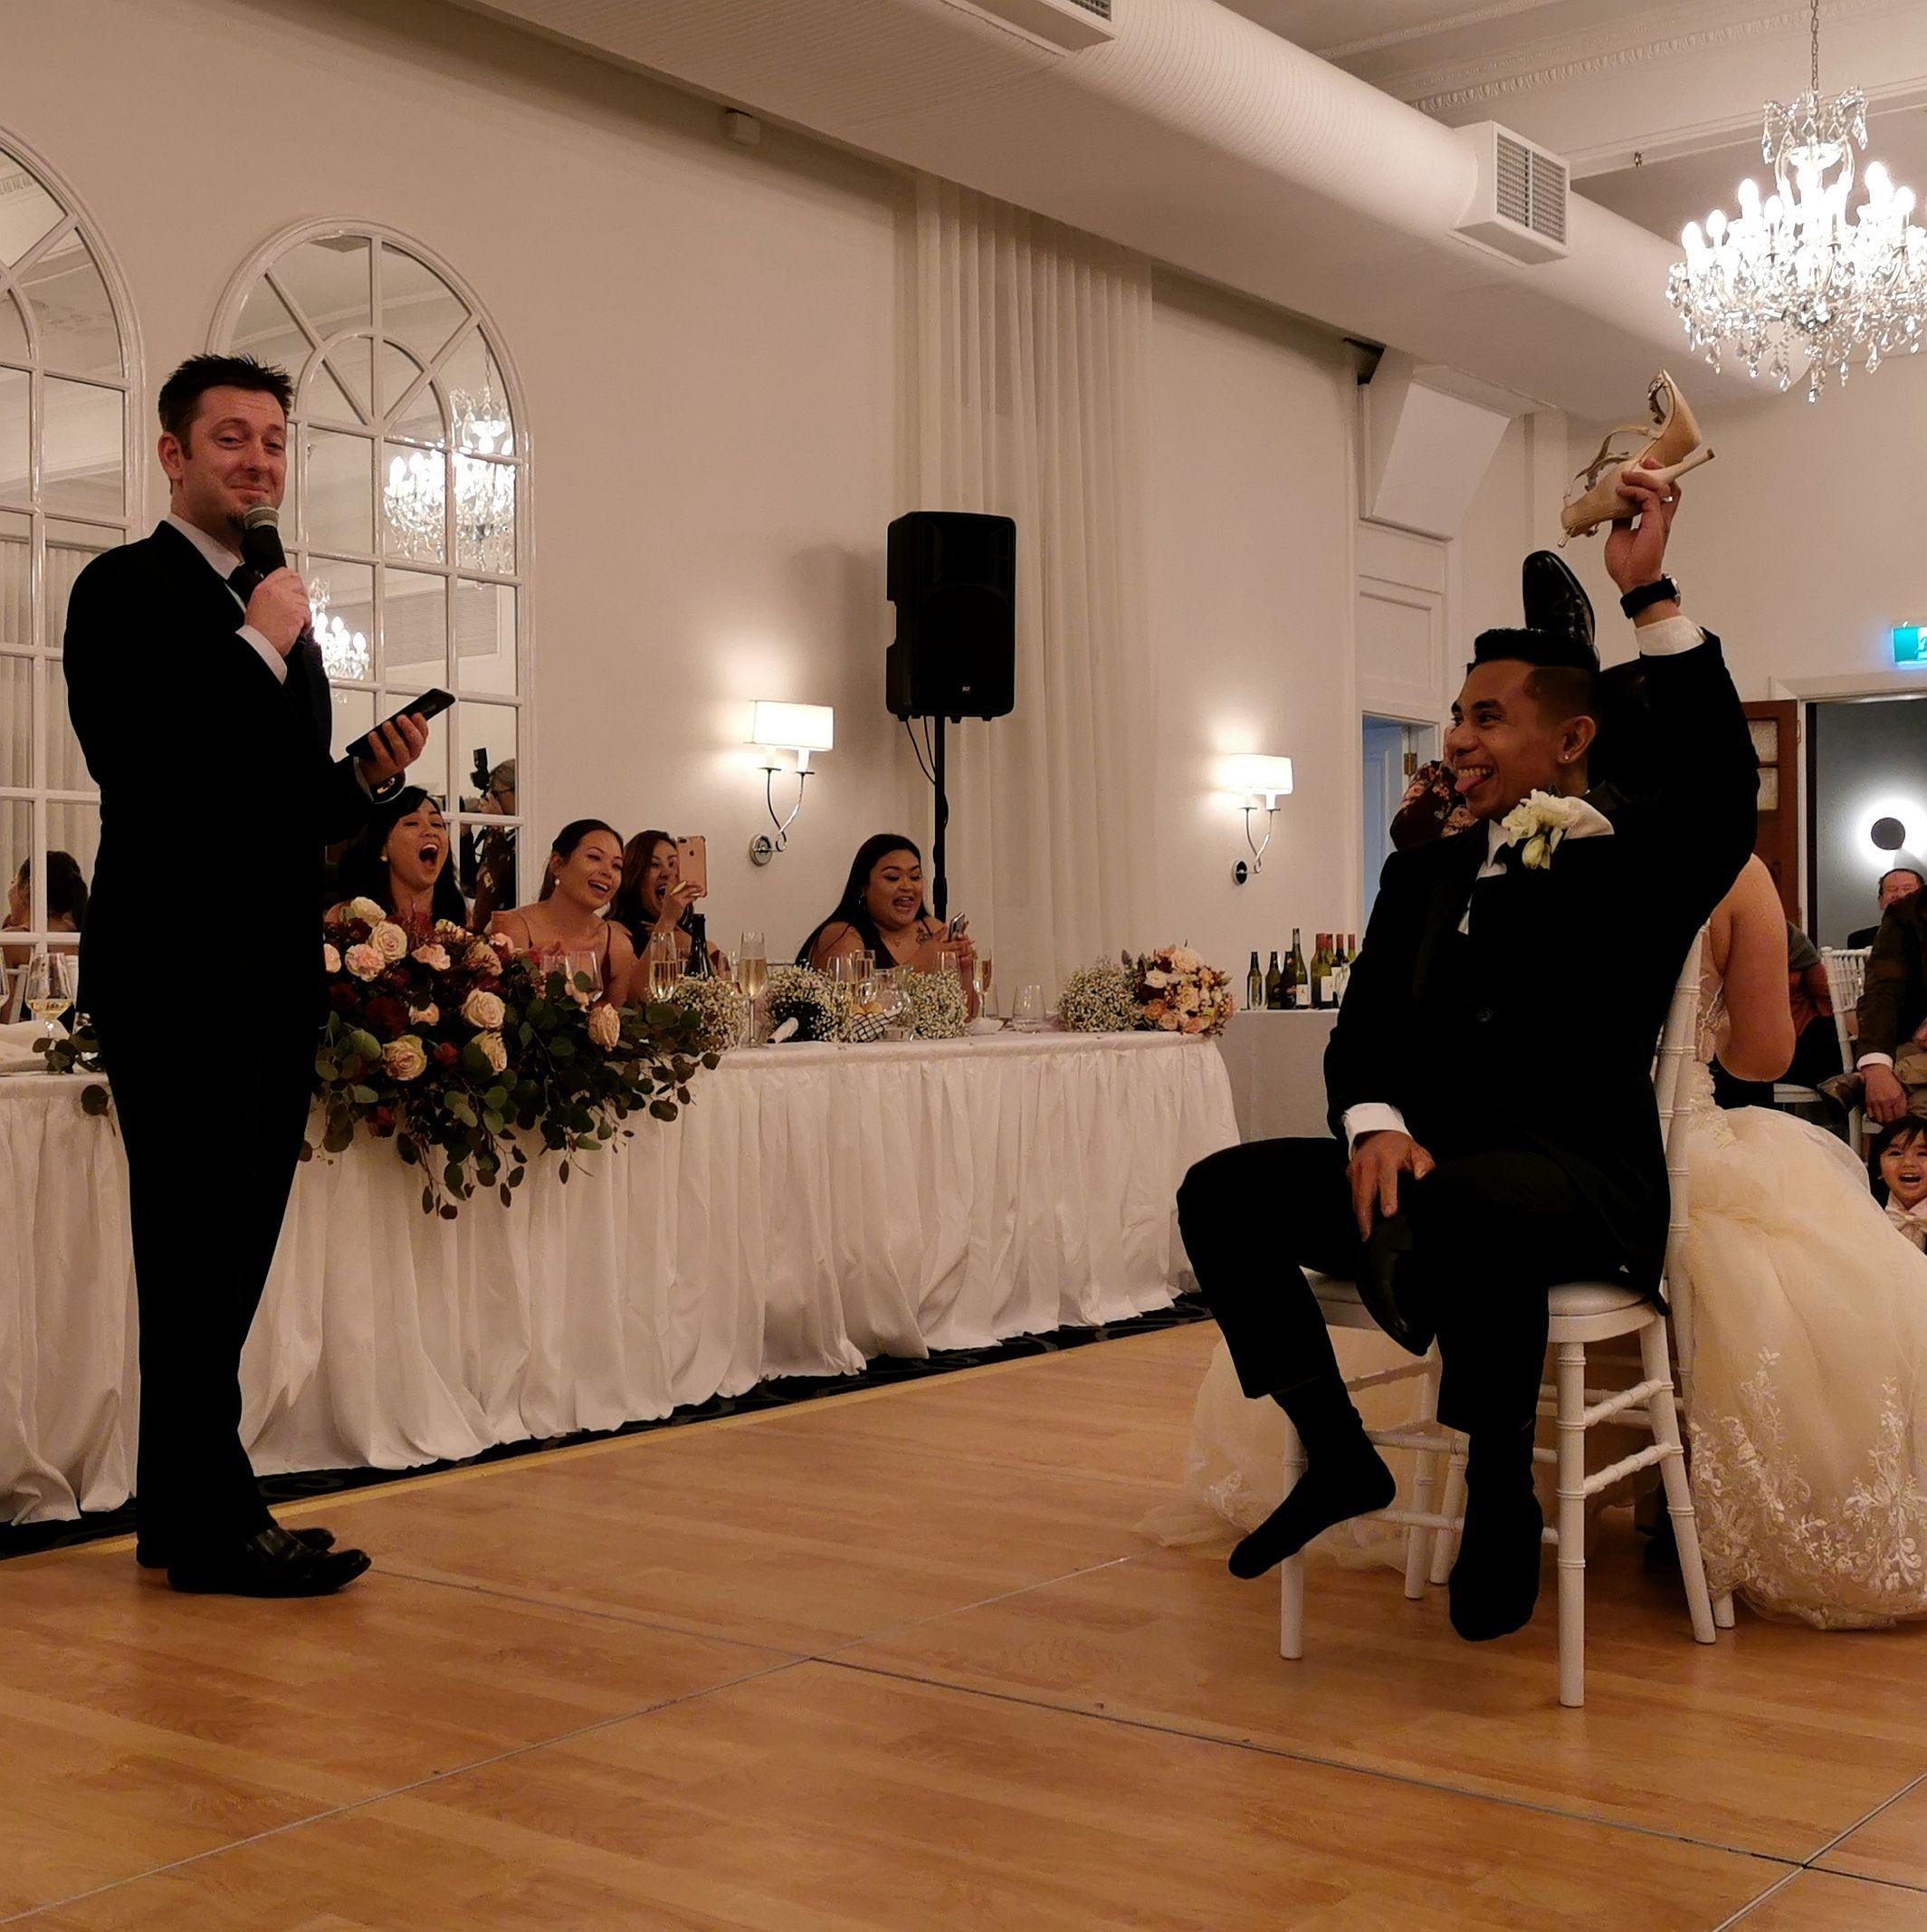 Longest Married Game, Shoe Game, Wedding Game, Fun WEdding Reception, MC, Master of Ceremonies Sydney MC, Sydney Celebrant, Hawkesbury Celebrant